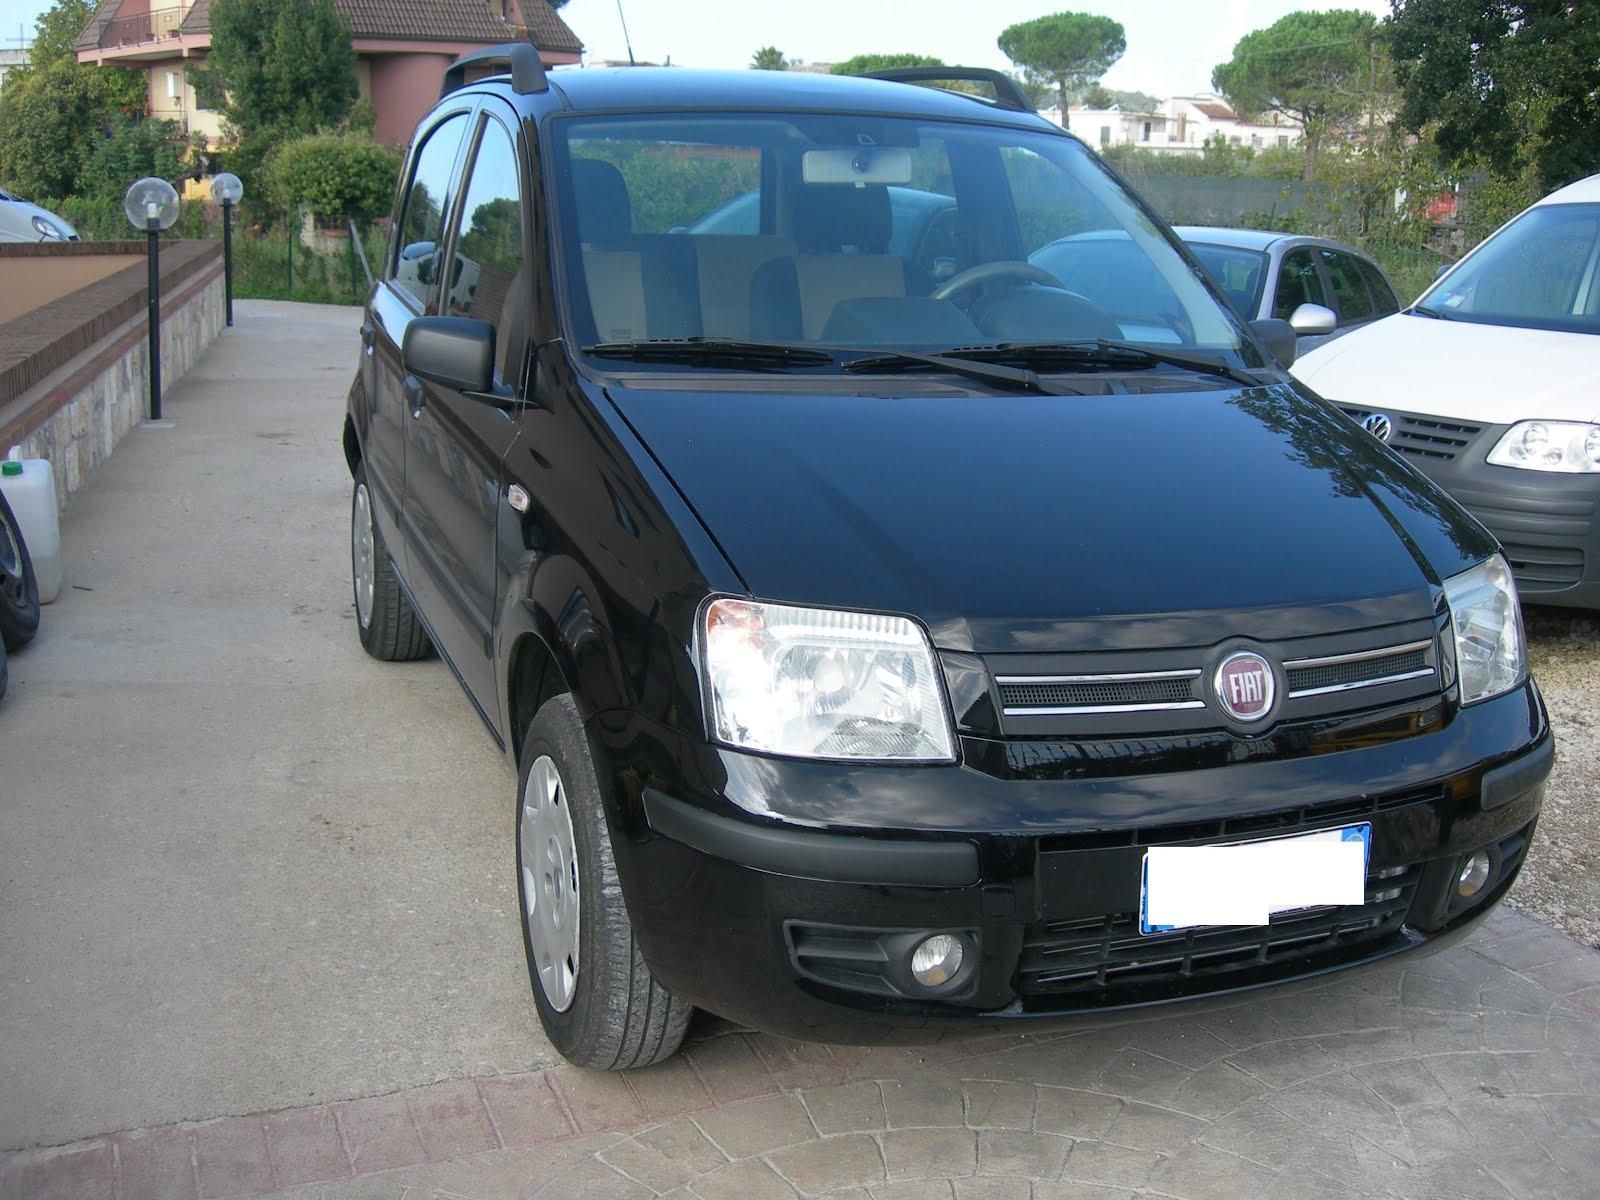 FIAT PANDA 1.2 NATURAL POWER METANO DINAMYC ANNO 2008 PREZZO 4.500,00 EURO